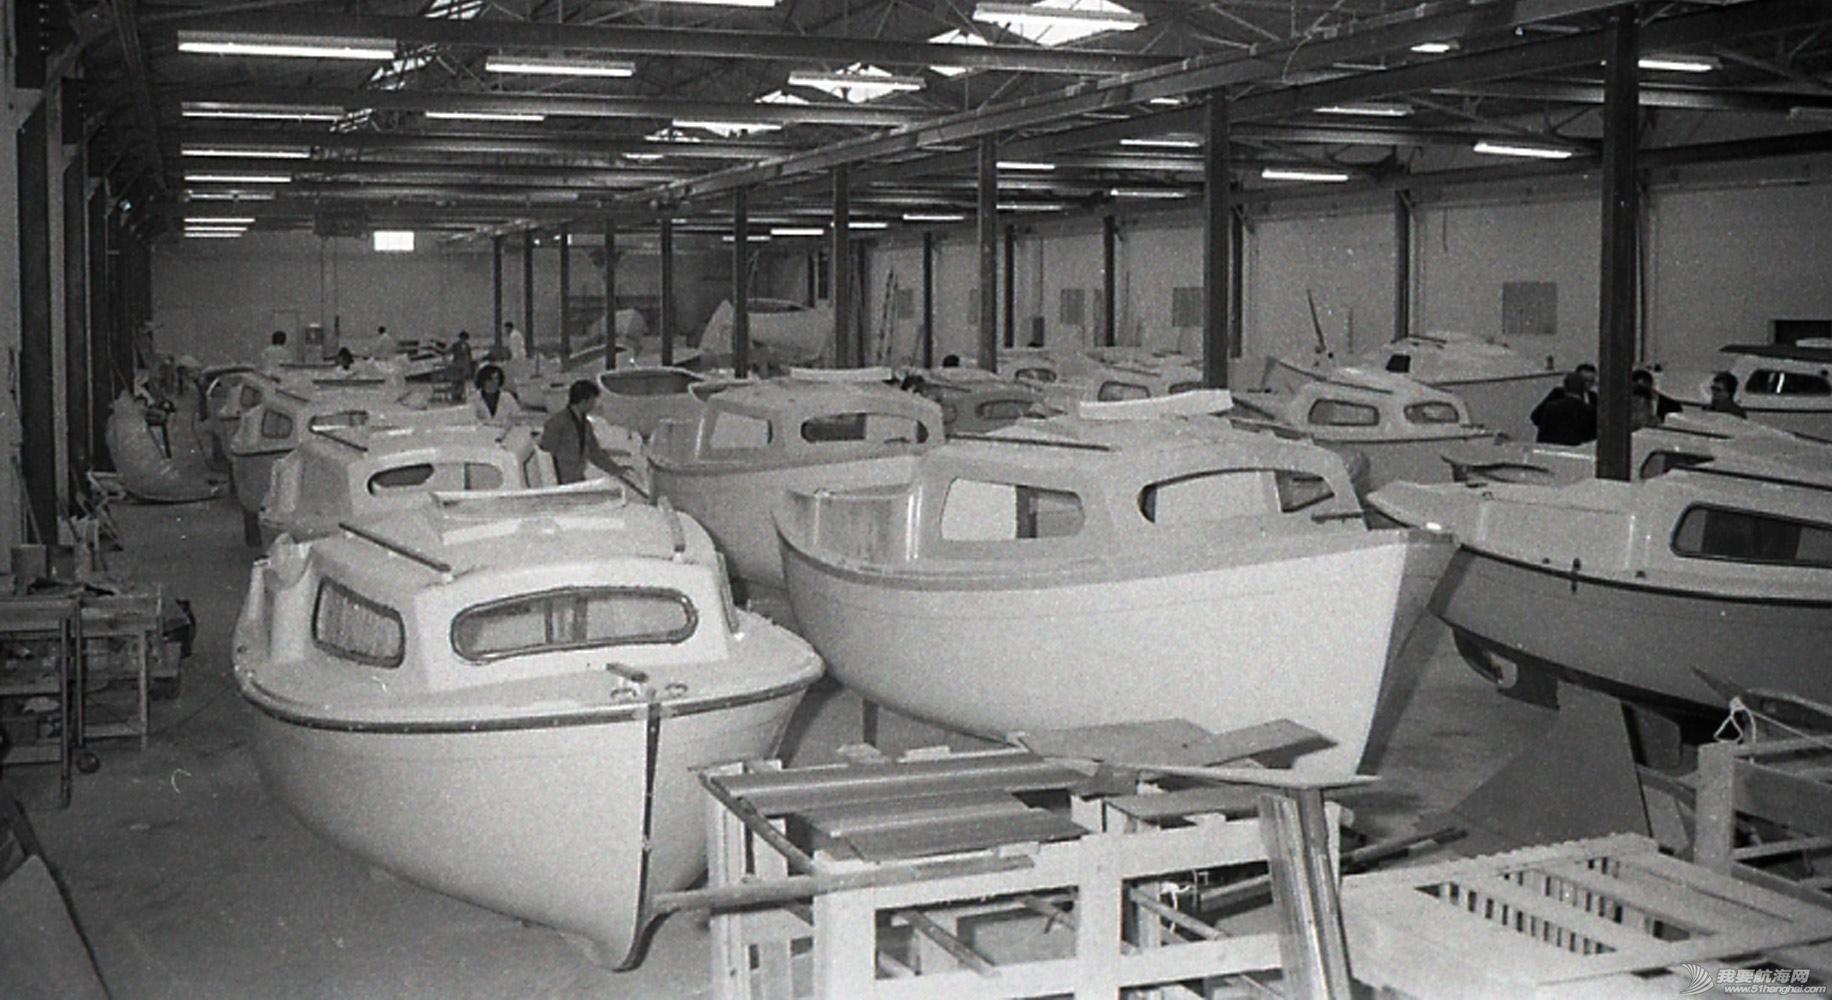 1972peches-promenade-usine1.jpg?itok=bqnICvzZ